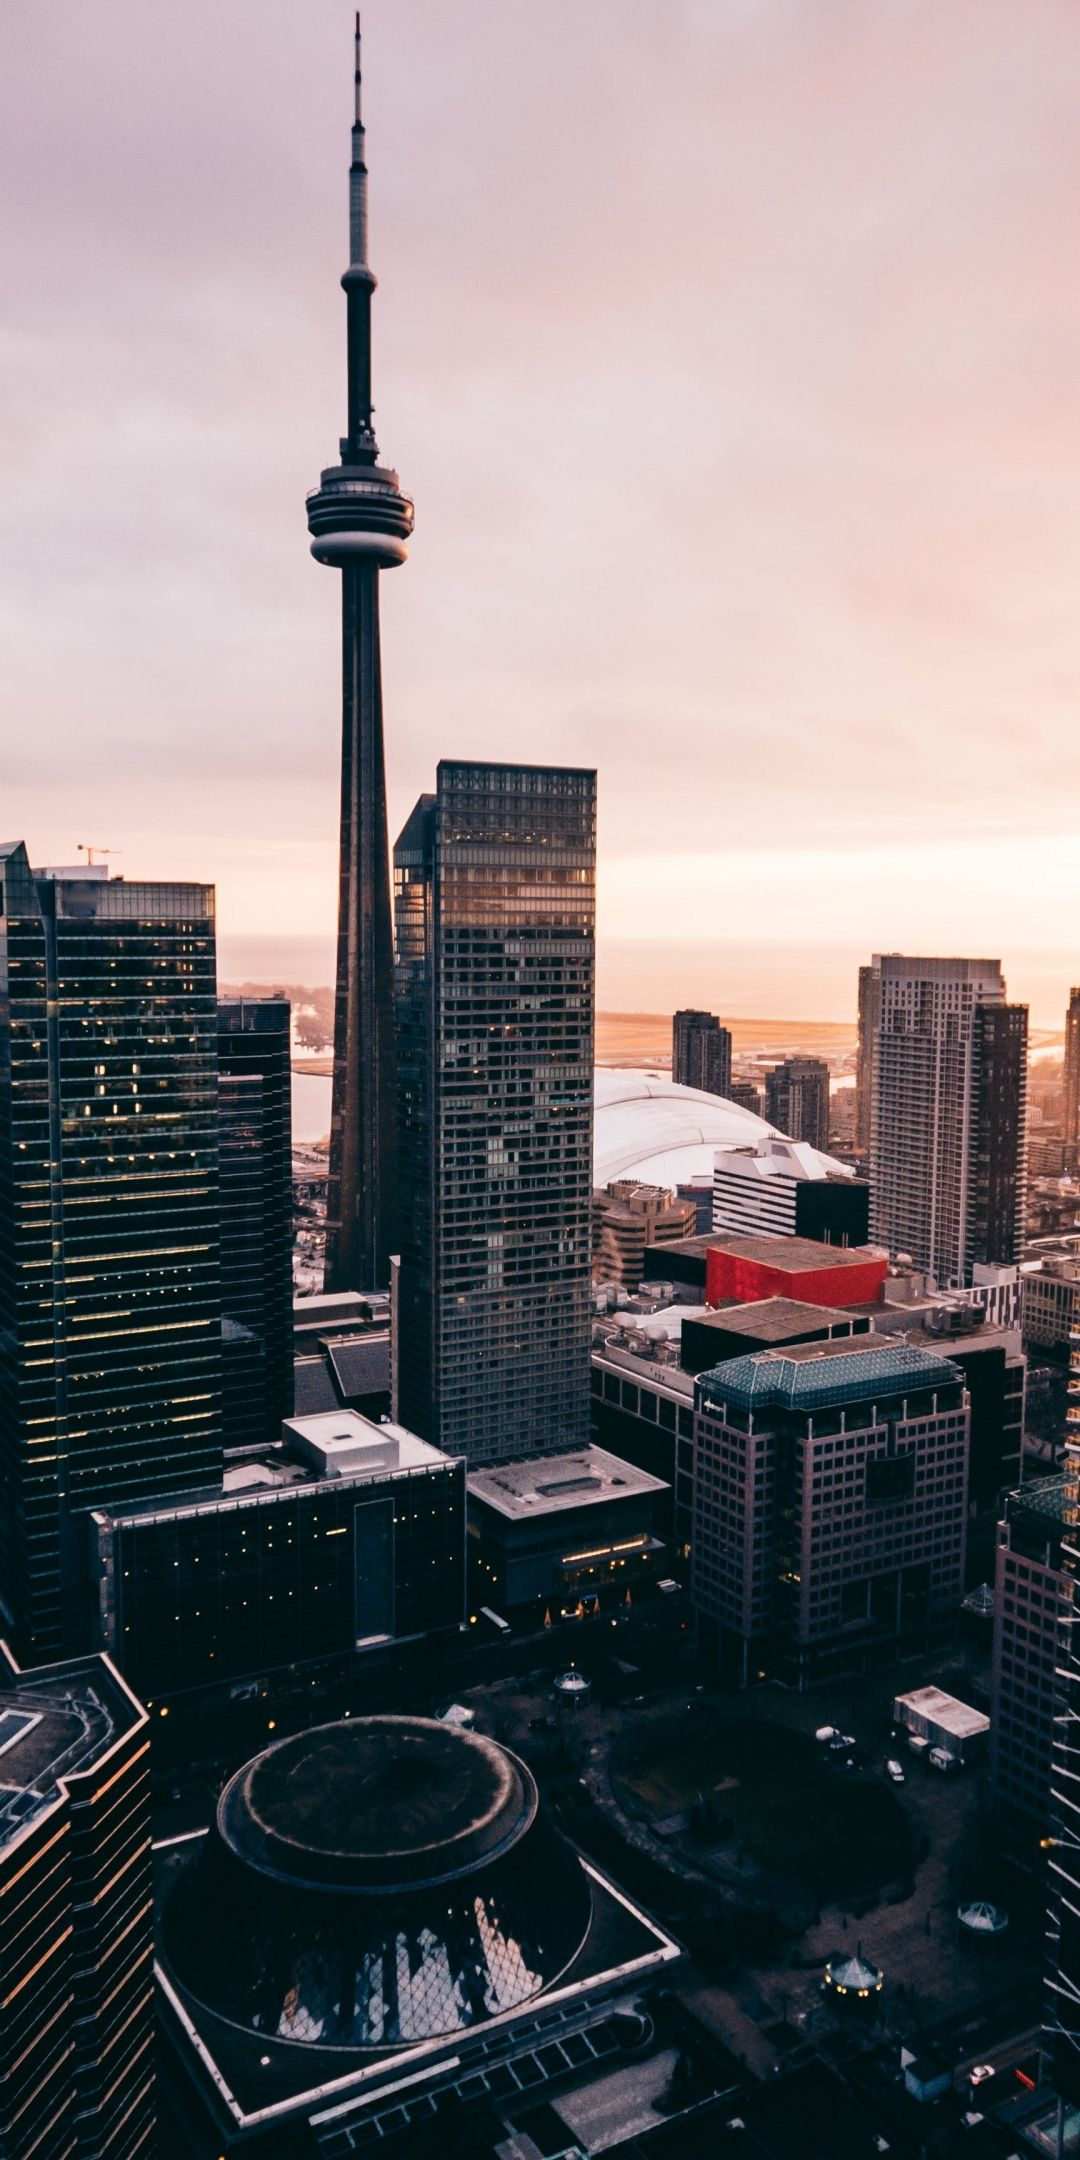 Cn Tower Toronto Buildings 1080x2160 Wallpaper Wallpaper Toronto Canada Photography Wallpaper Canada